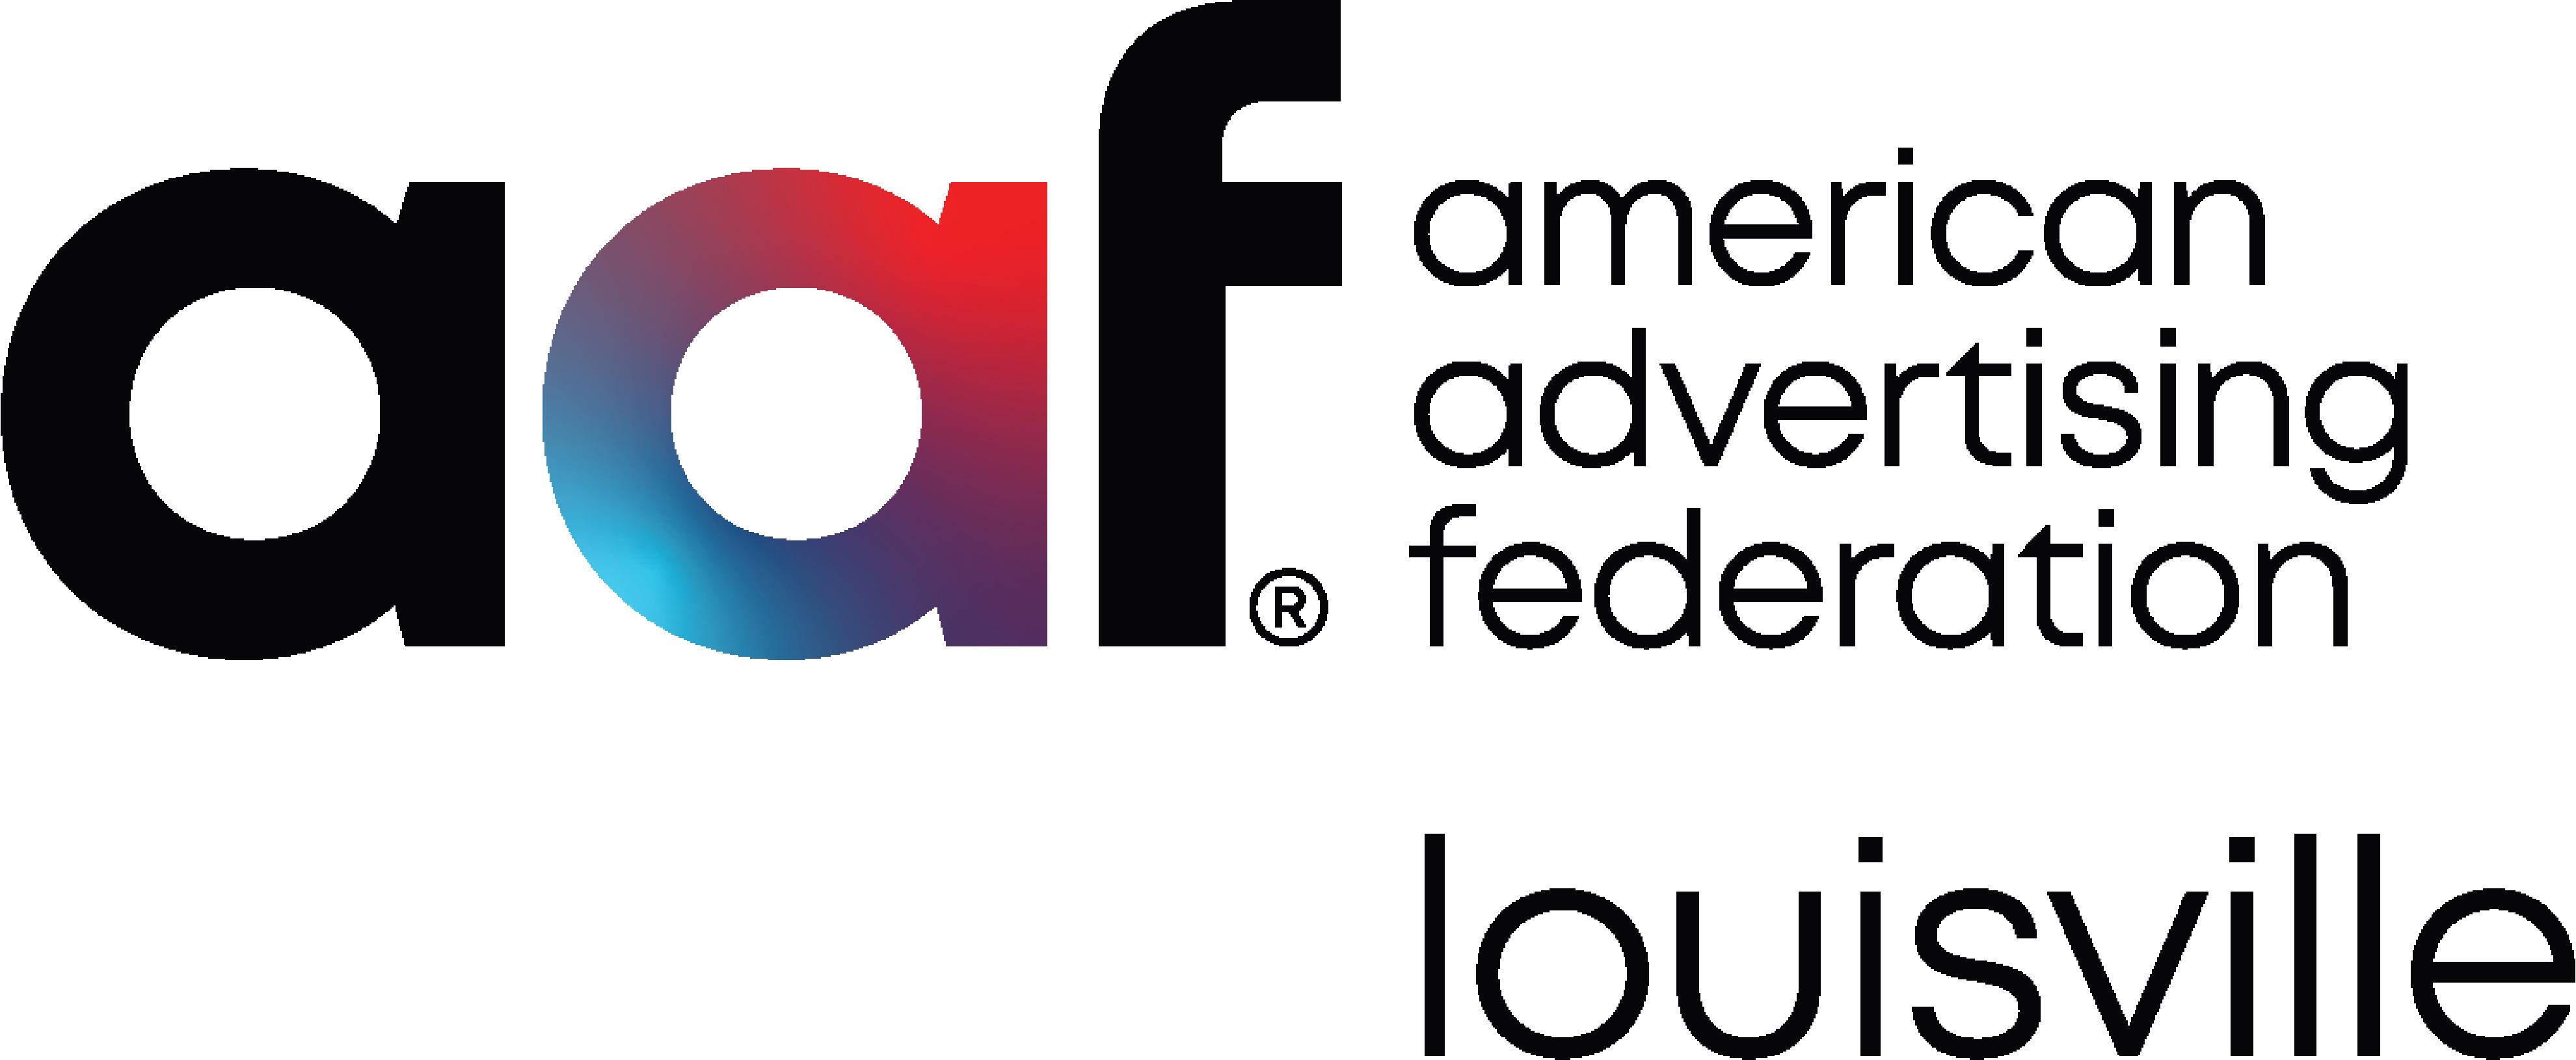 American Advertising Federation - Louisville logo